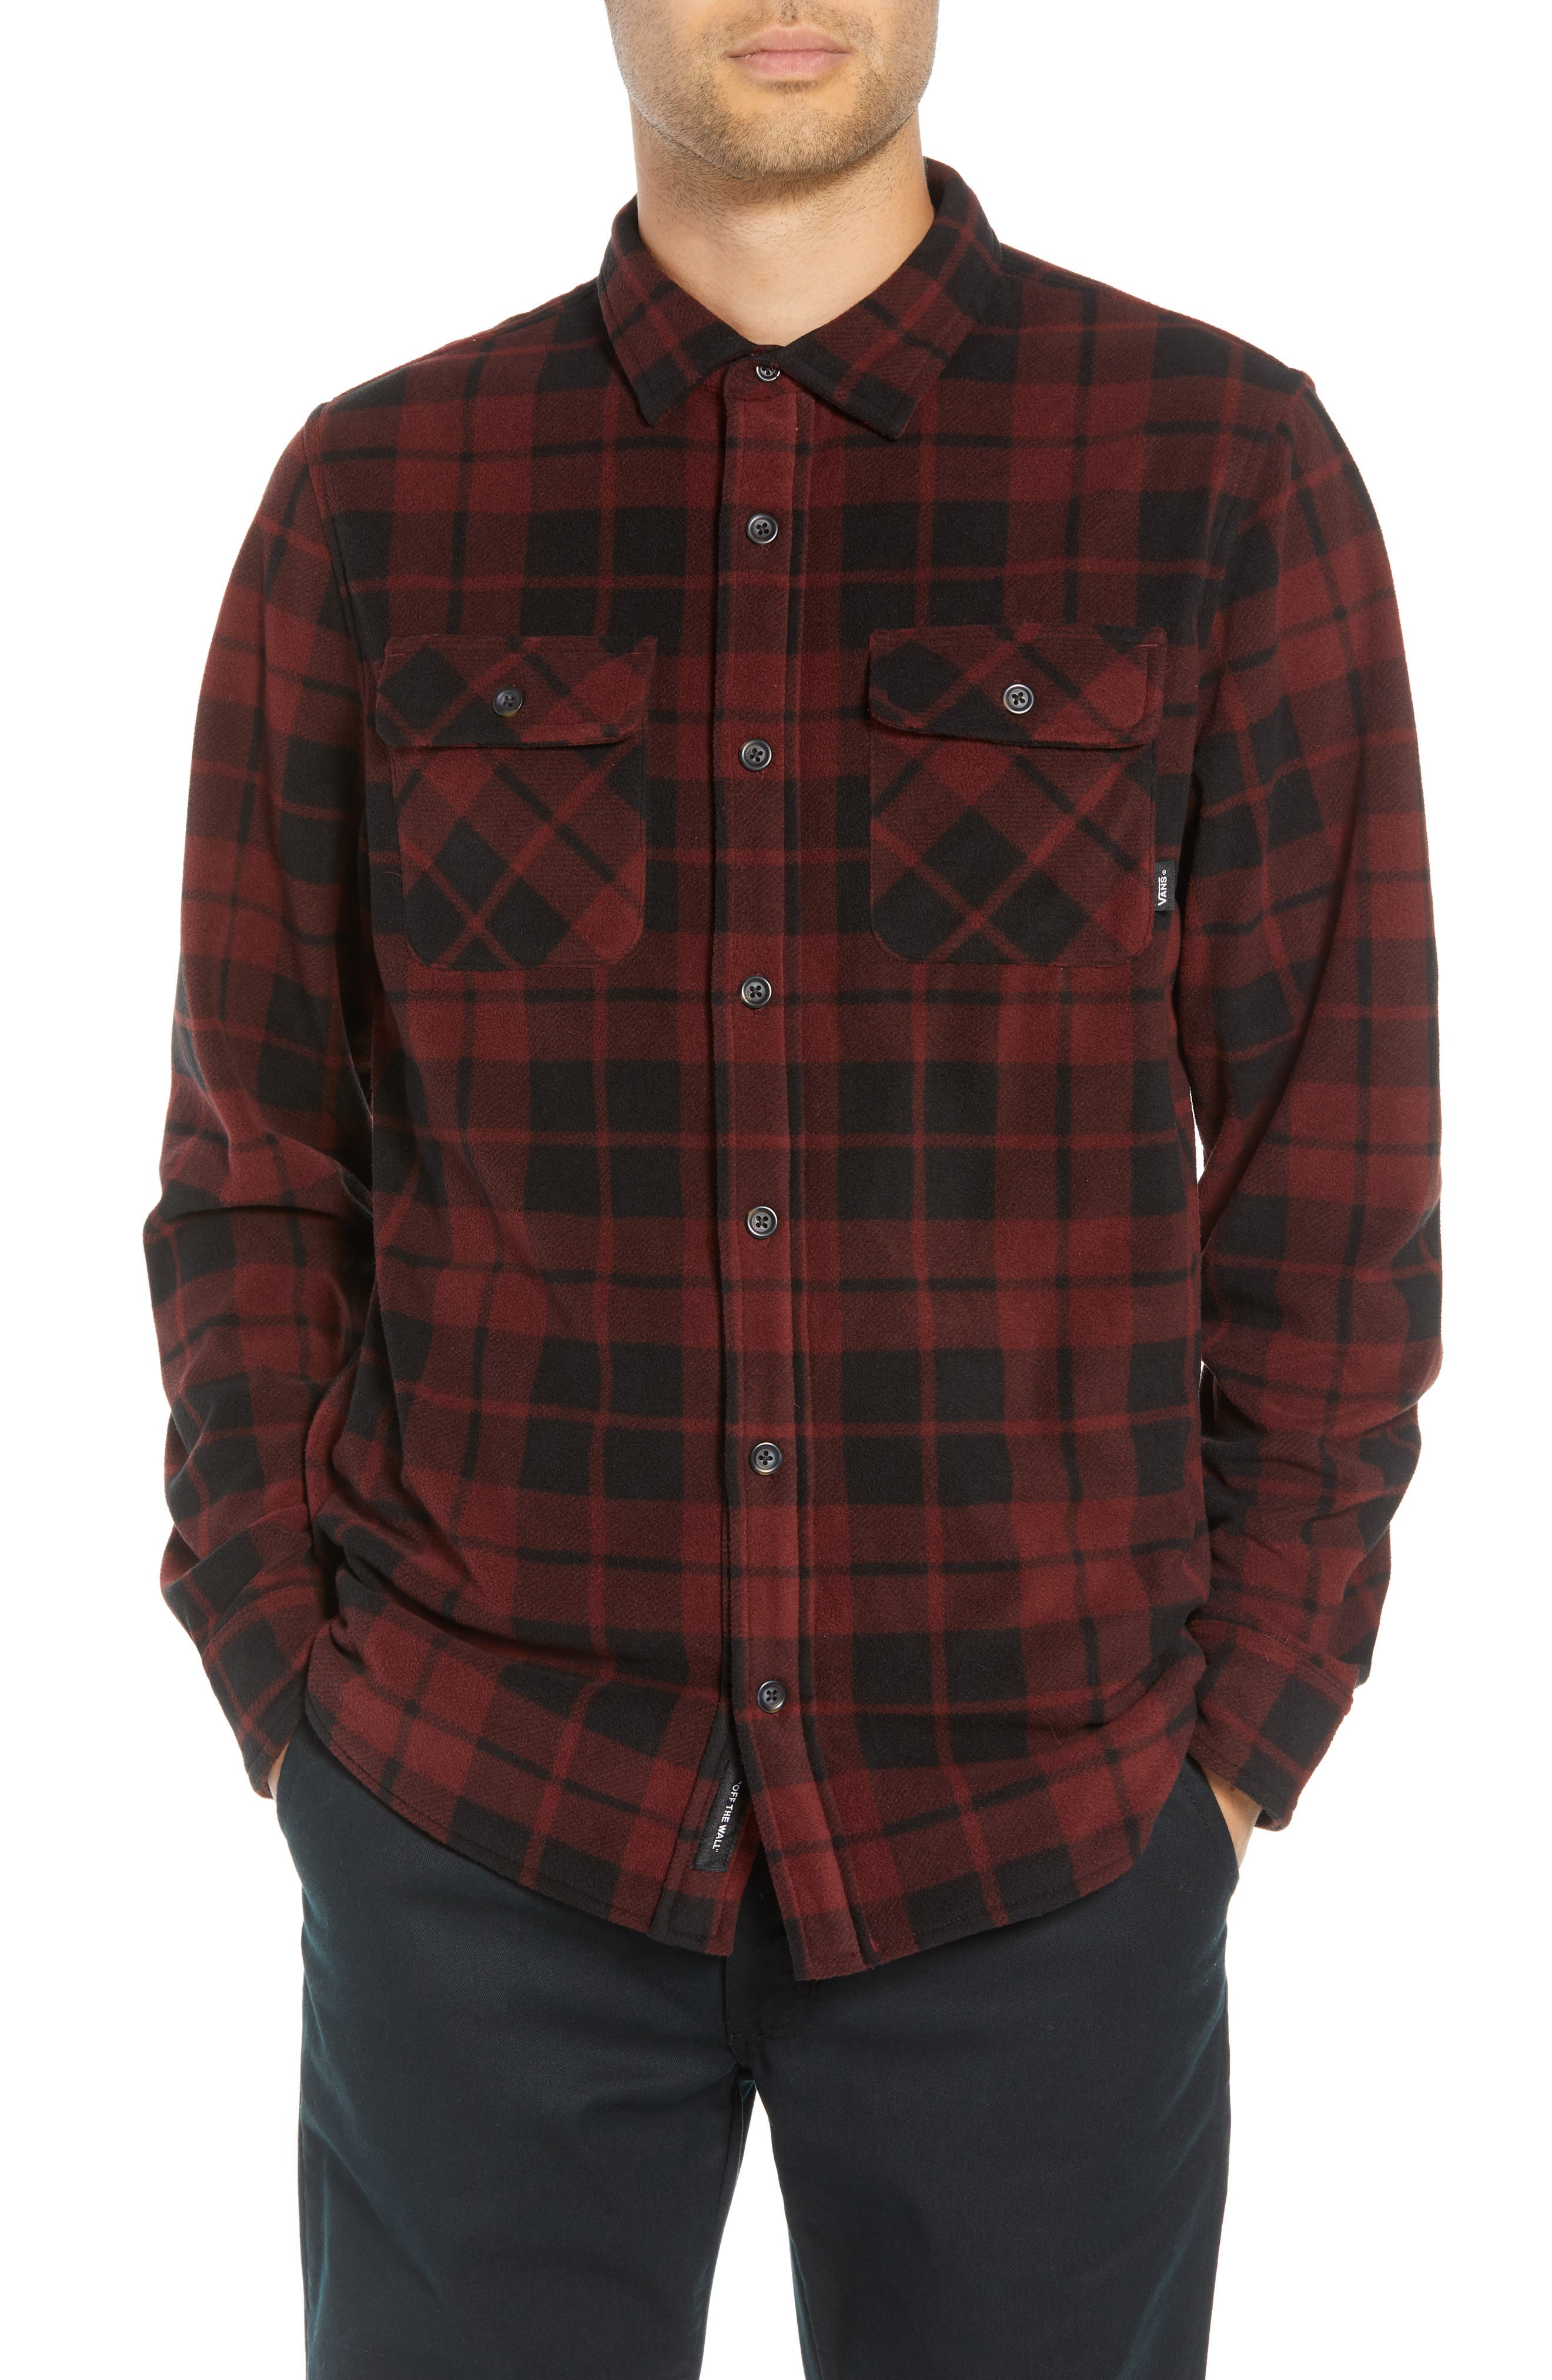 Hillcrest Fleece Shirt,                             Main thumbnail 1, color,                             930